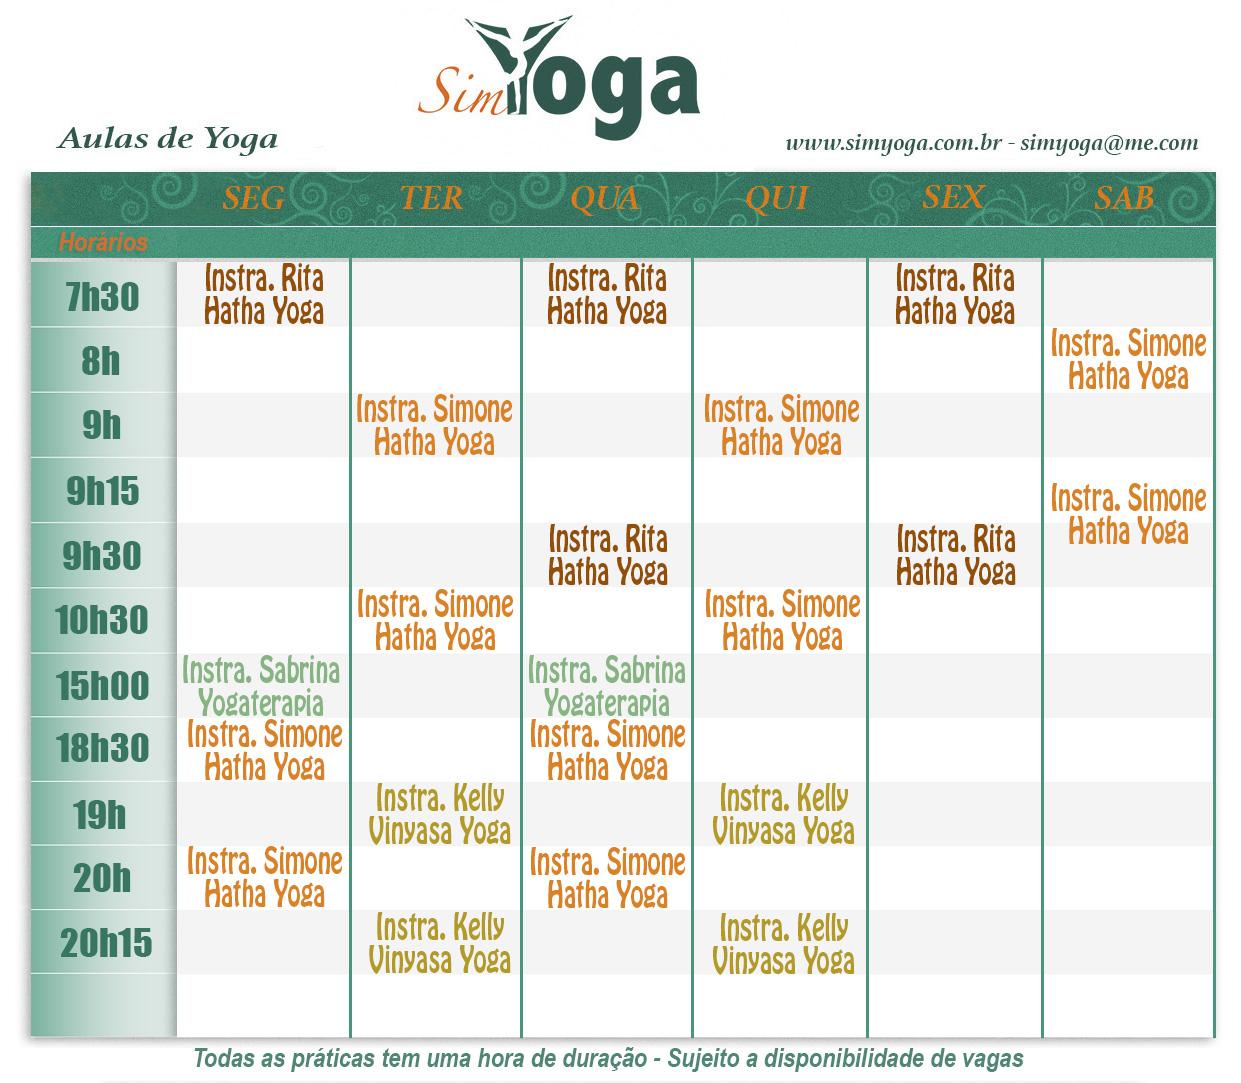 tabela-sim-yoga-2016-2